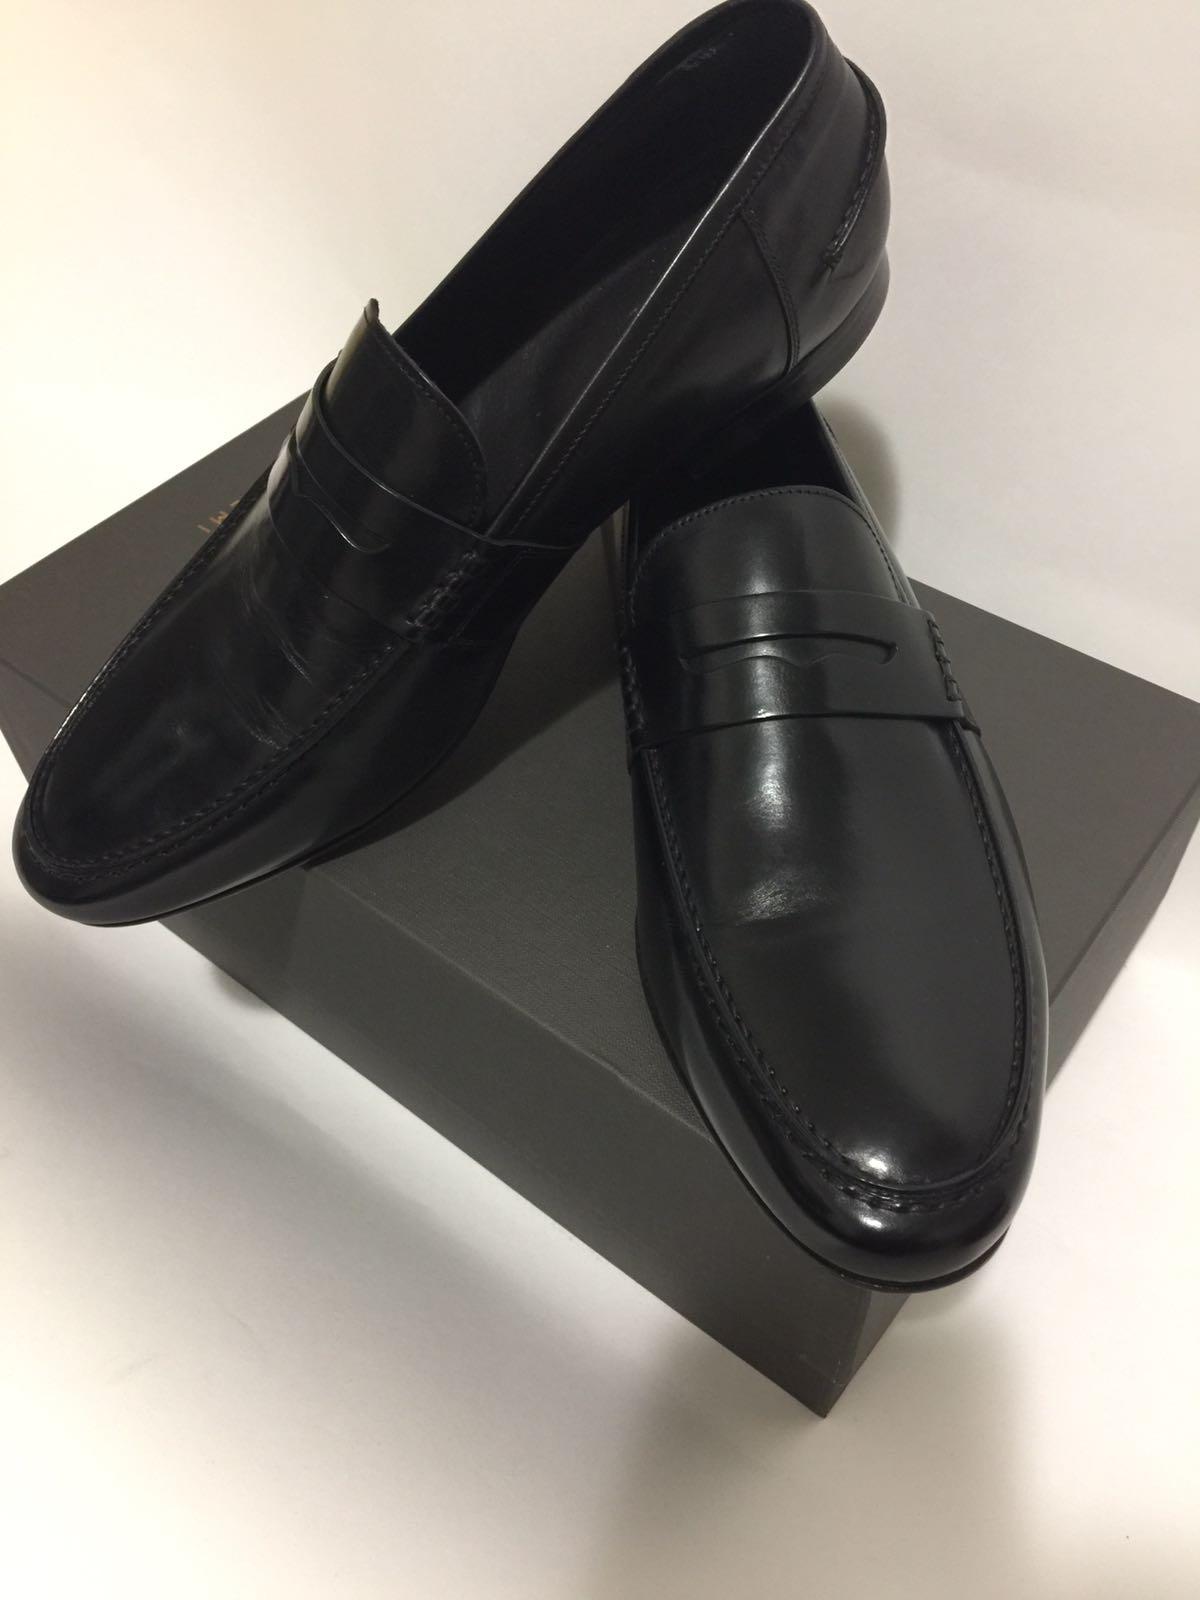 The M.Gemi black penny loafer